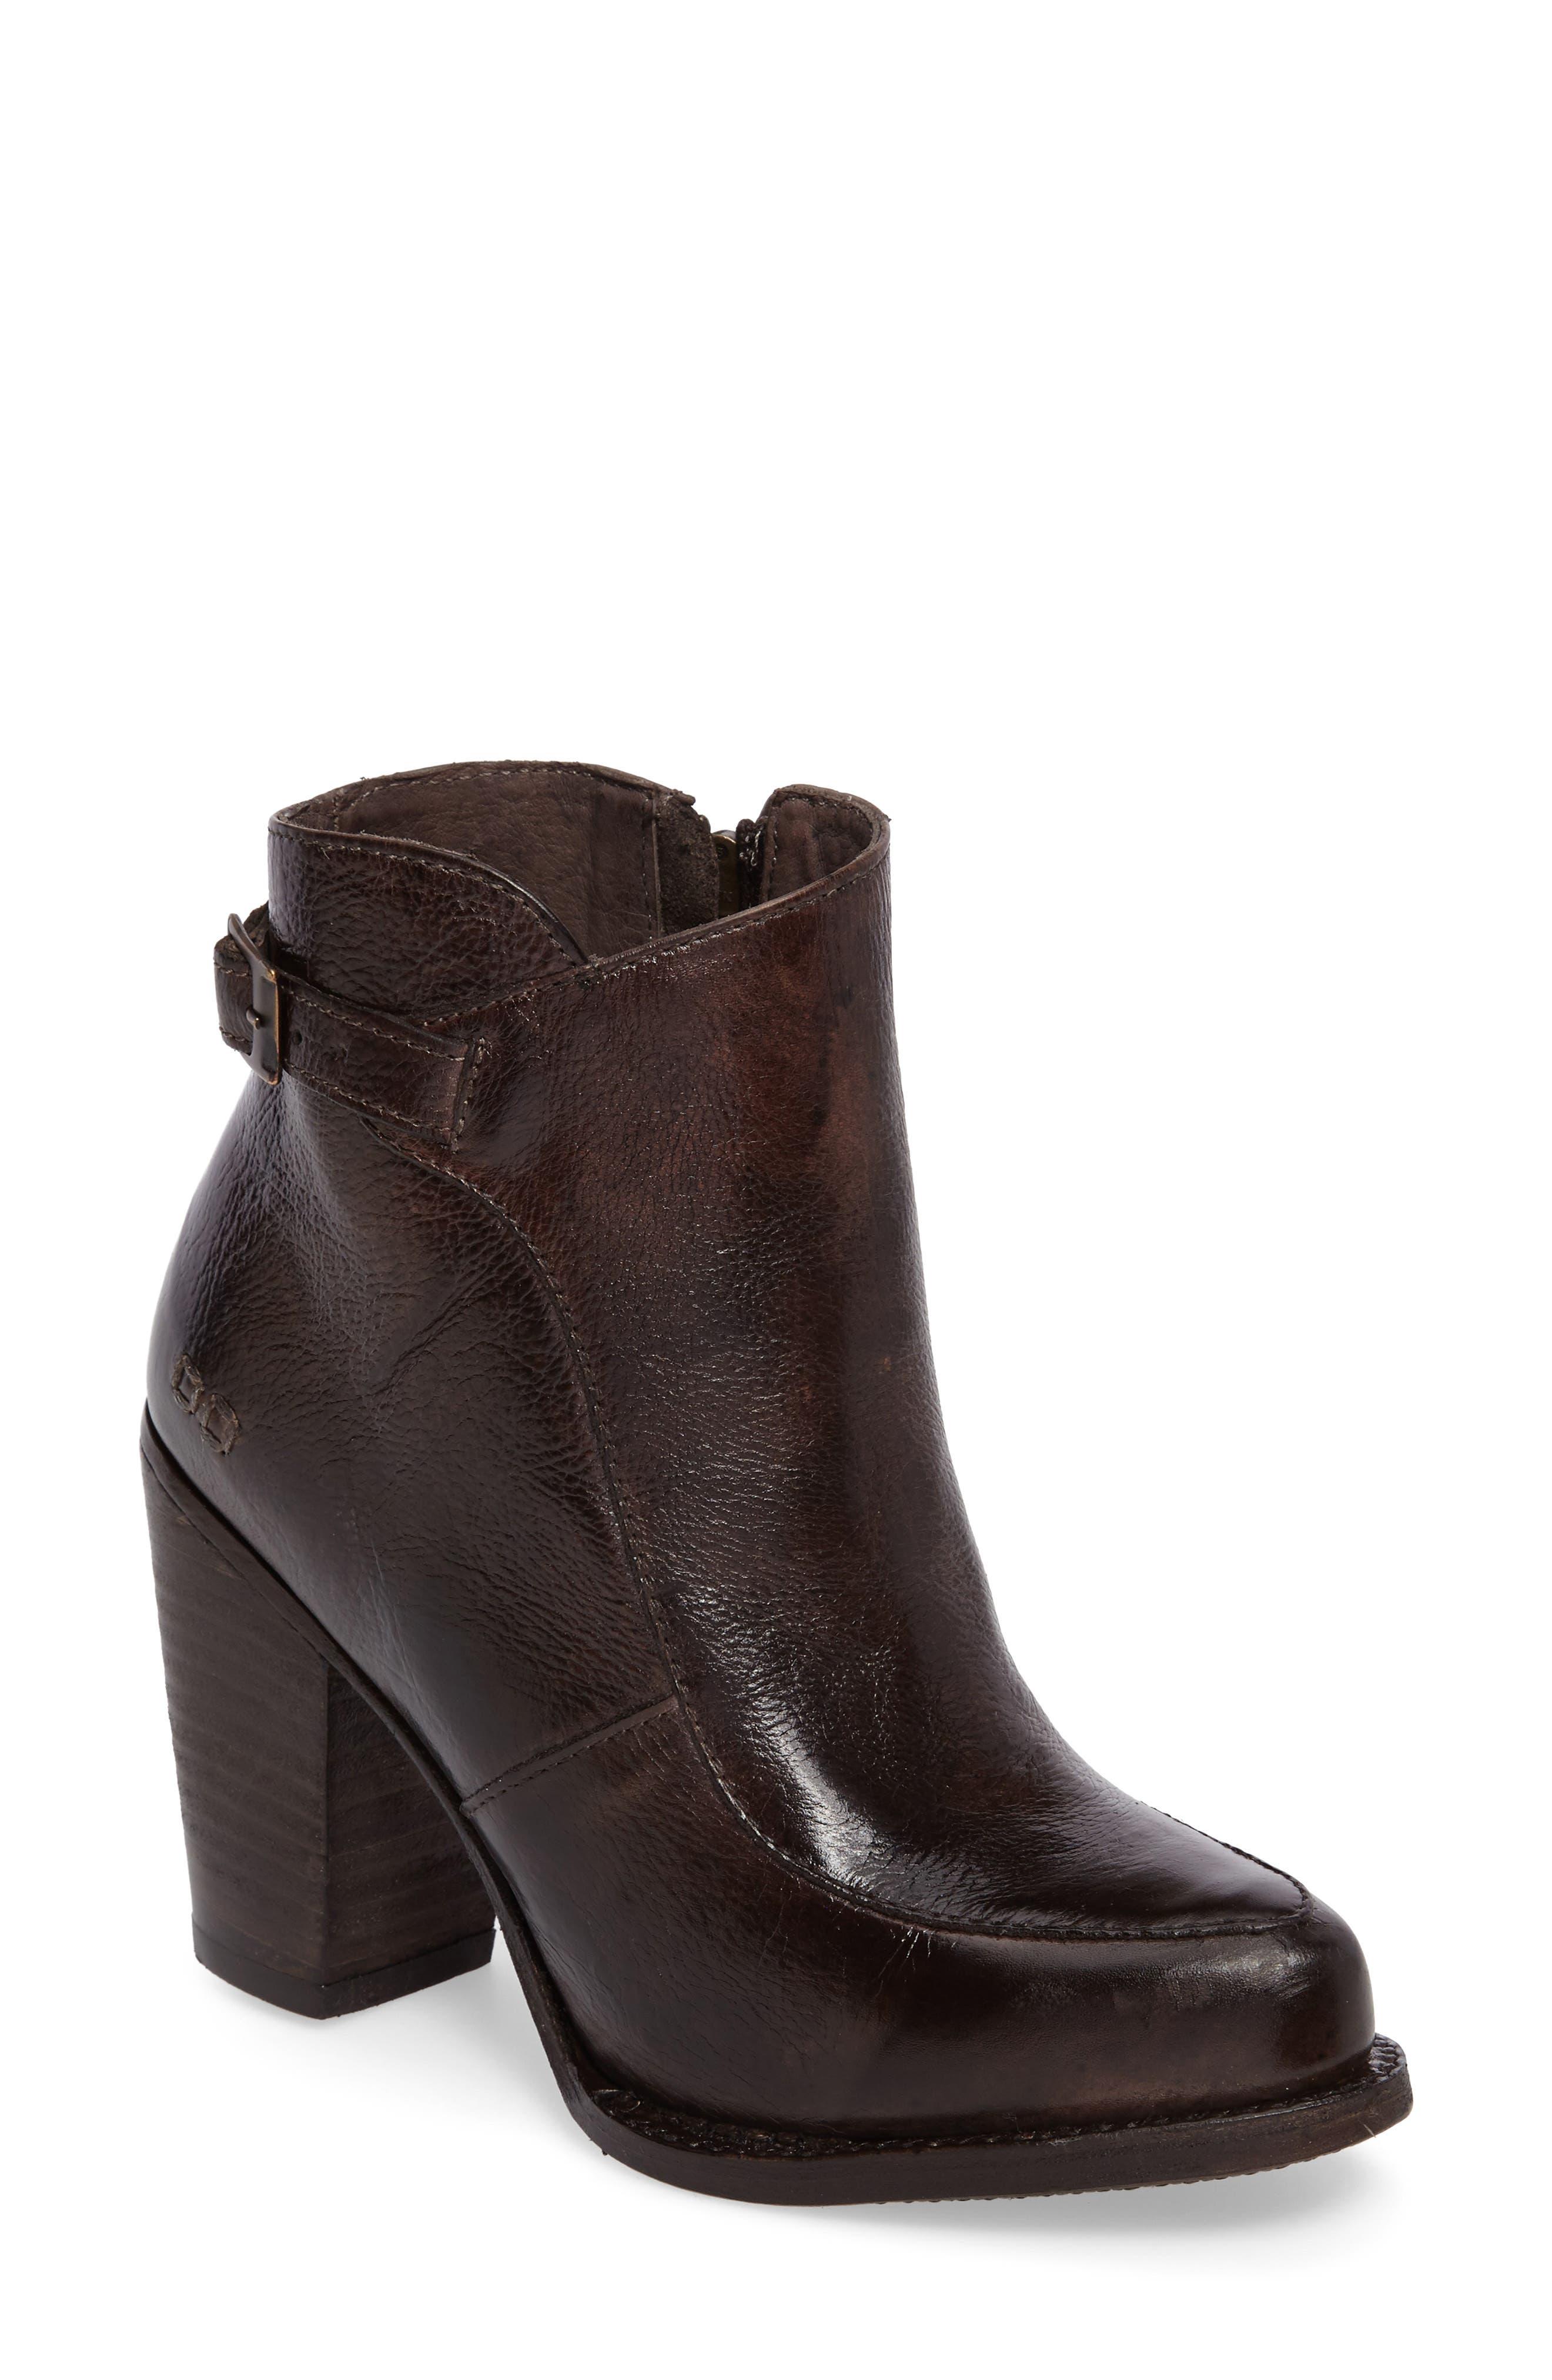 'Isla' Stacked Heel Boot,                         Main,                         color, 201